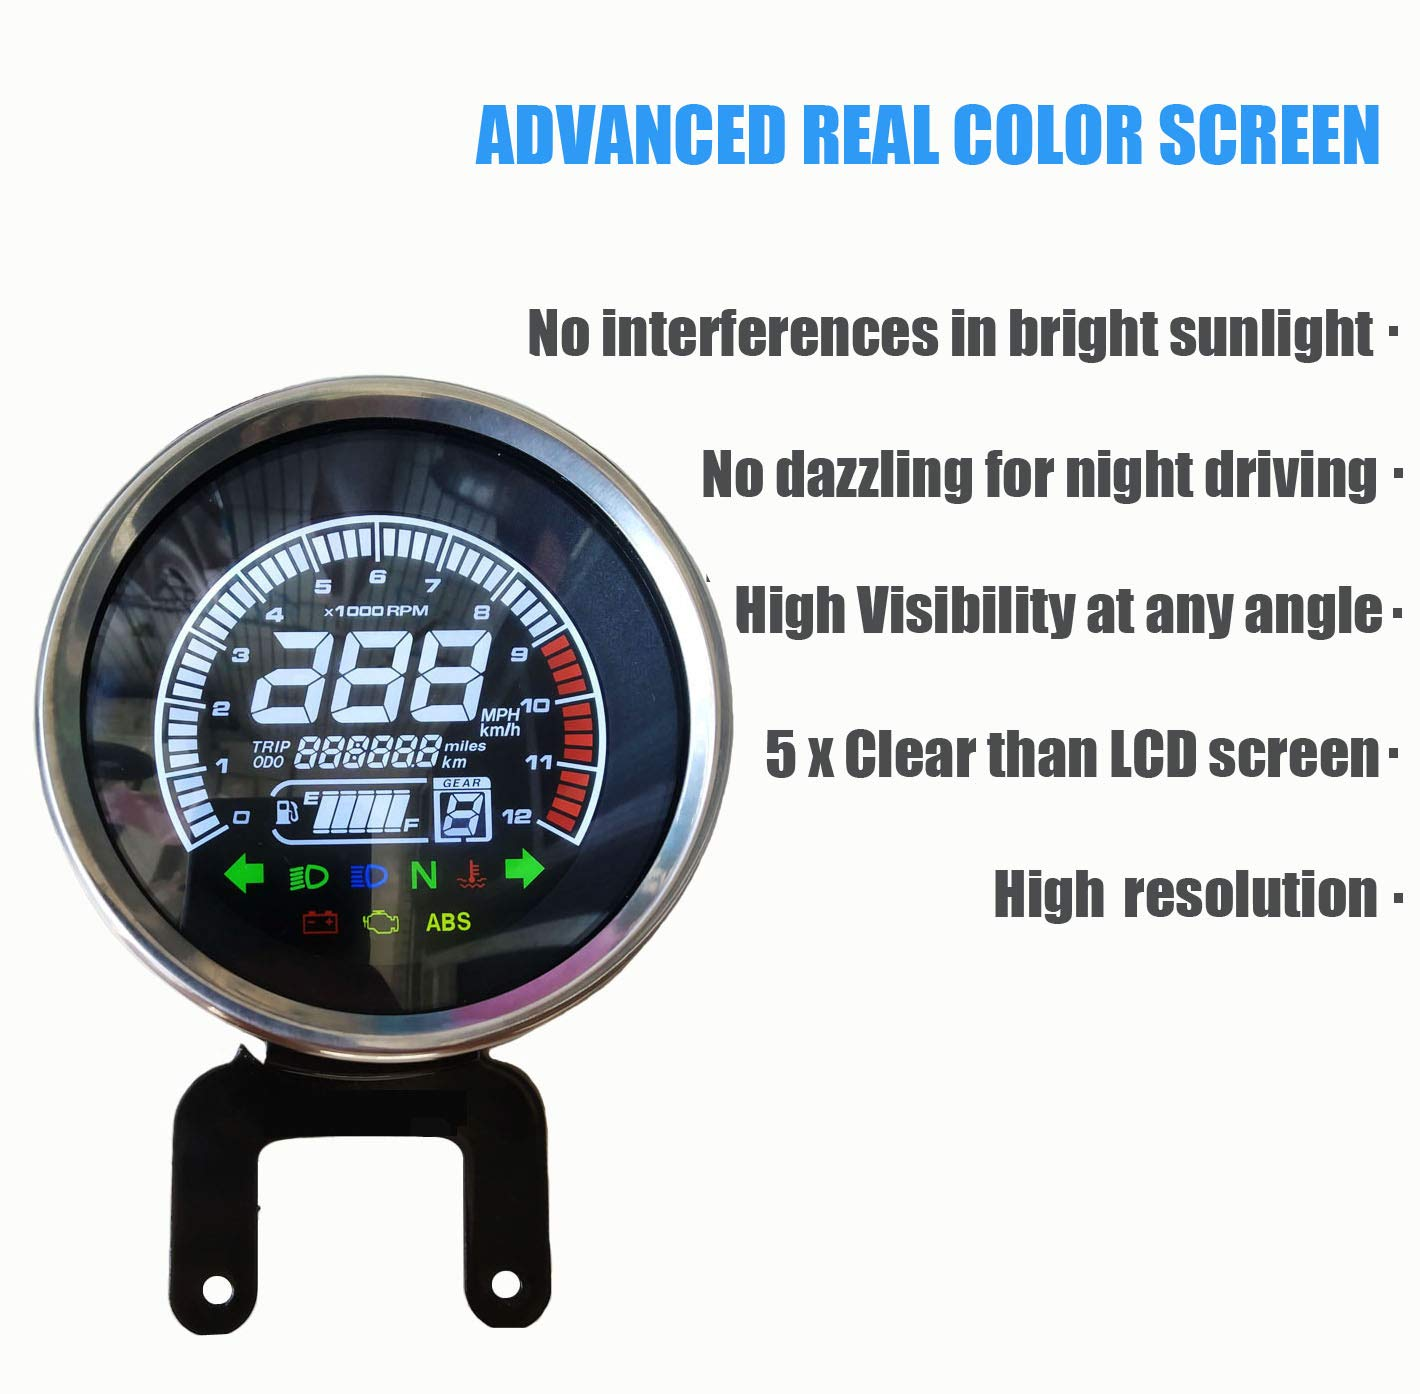 Veloc/ímetro de Motocicleta BiuZi 2 en 1 LED Digital Impermeable para Motocicleta Volt/ímetro Tac/ómetro Calibrador de Metal Od/ómetro Veloc/ímetro